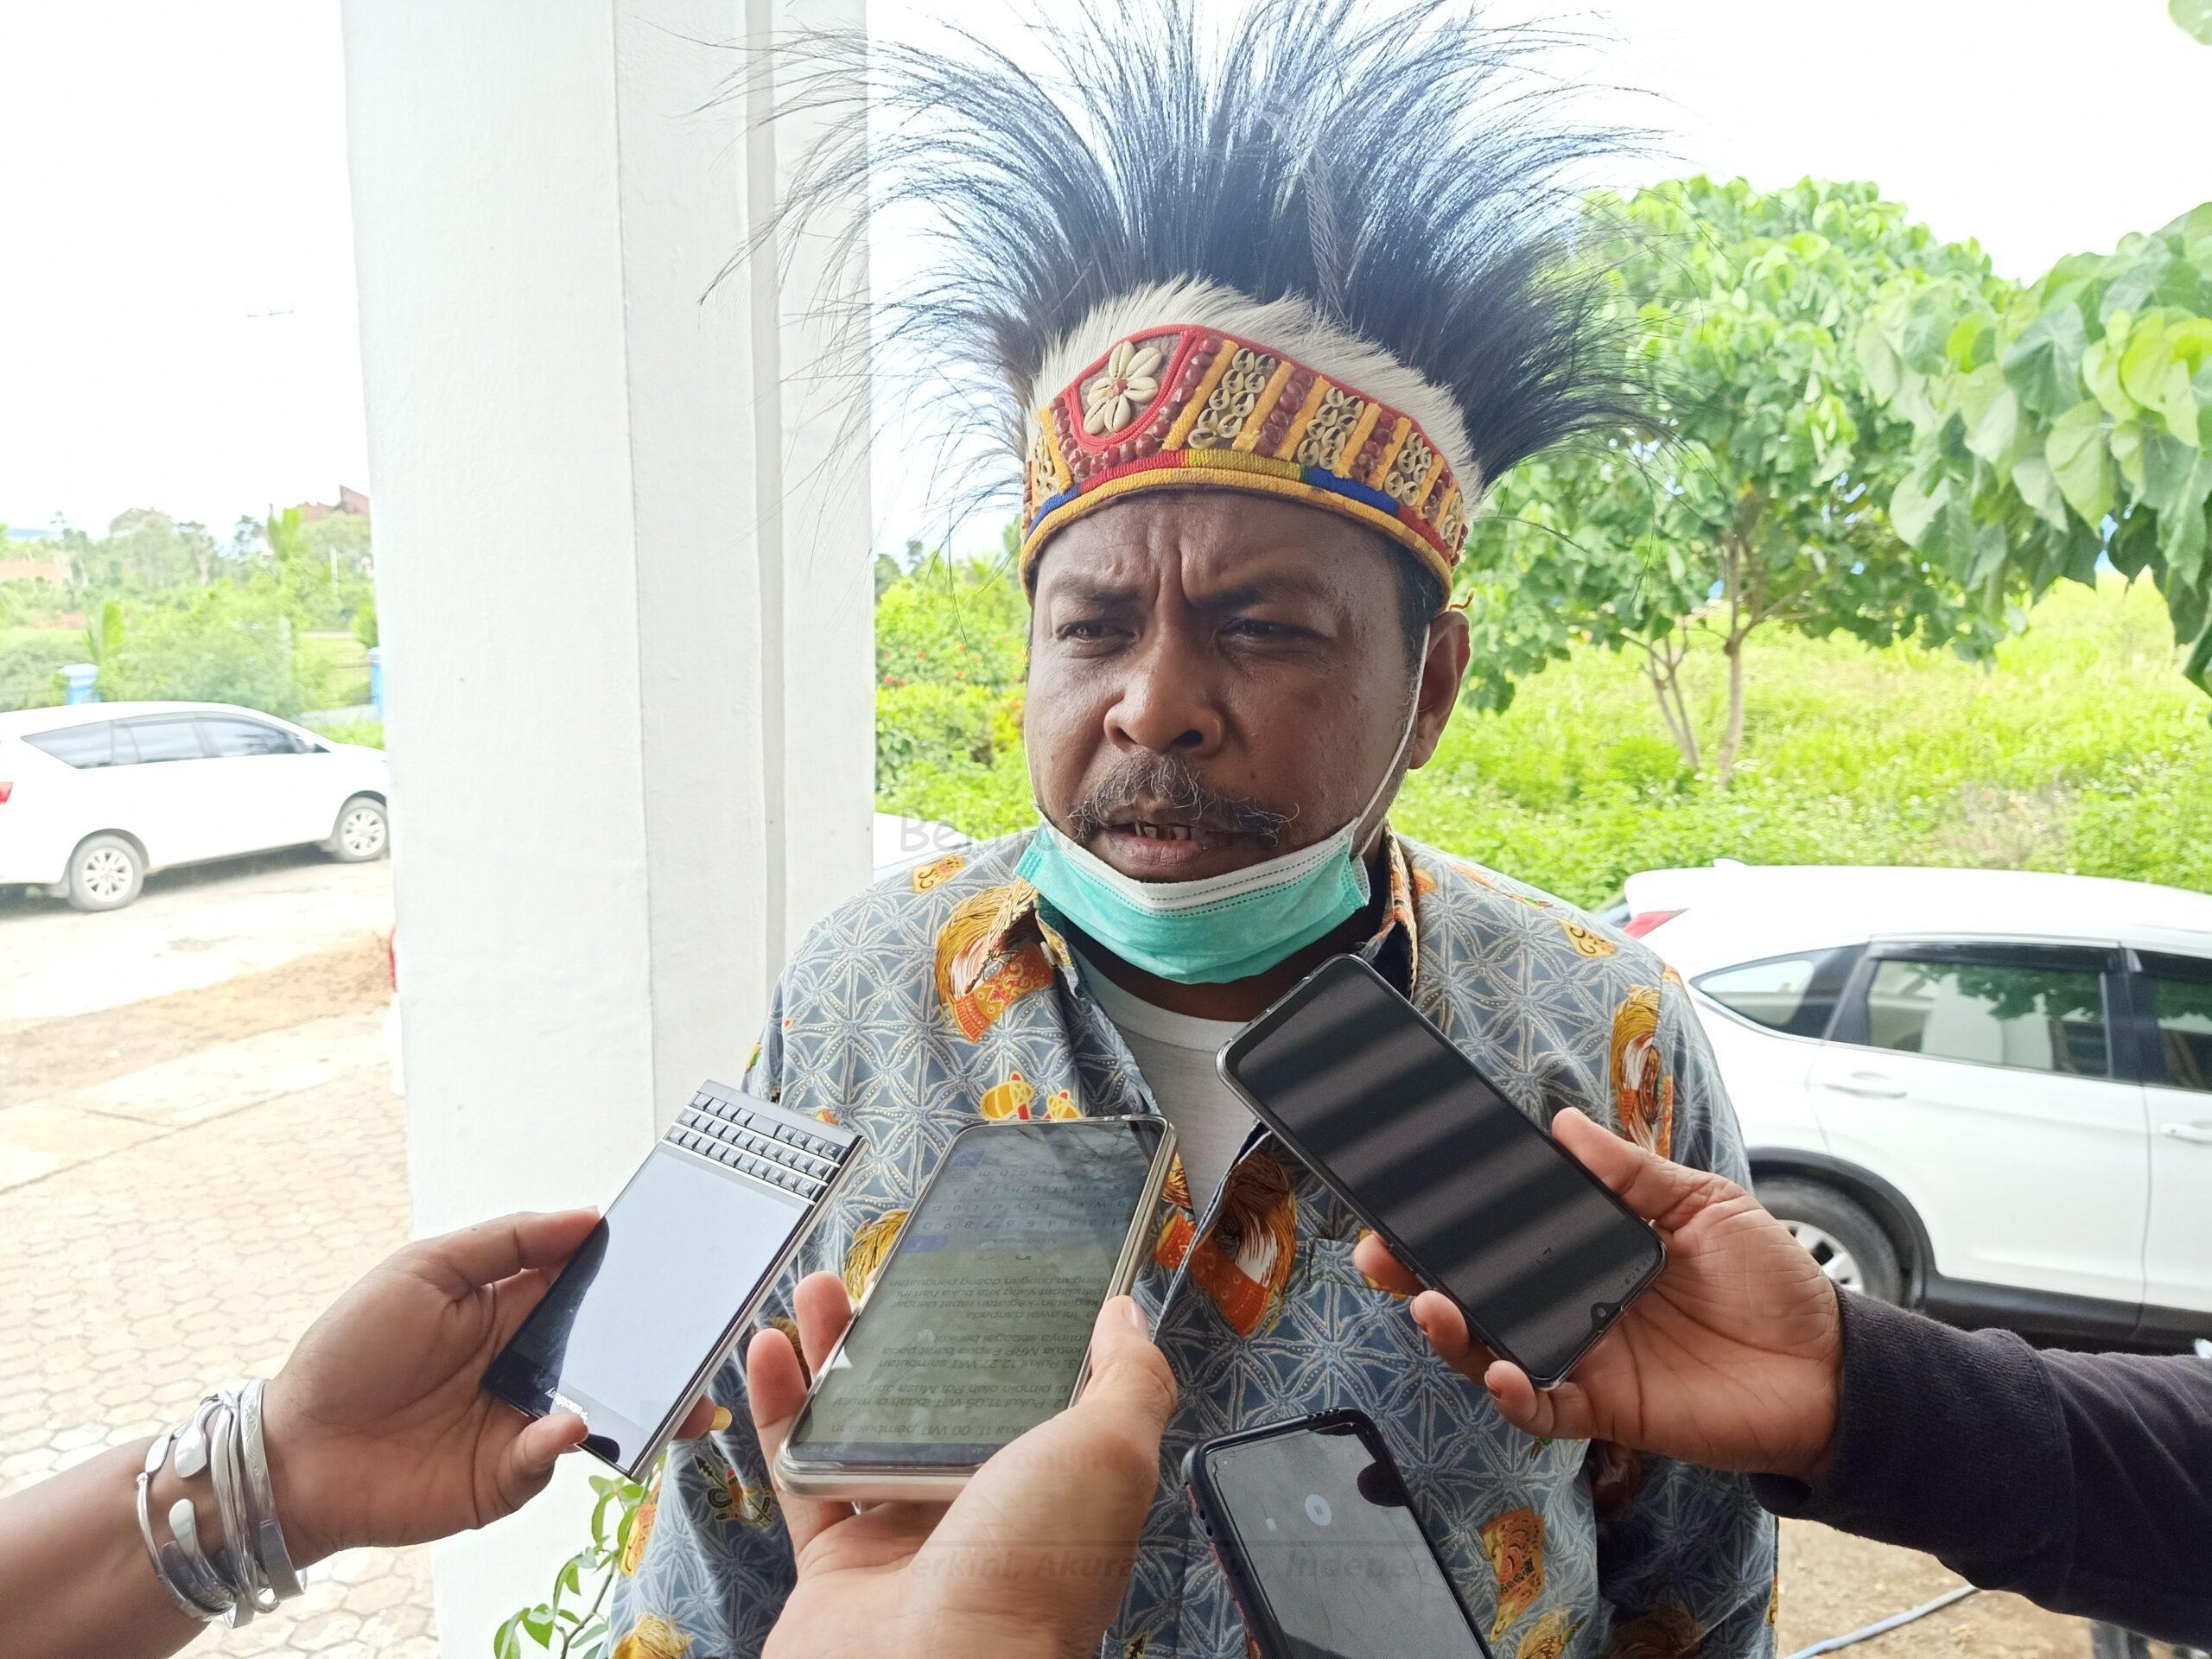 Ketua MRP PB: Data Pemohon Rekomendasi Bintara Otsus Membludak 32 IMG20200924124836 scaled